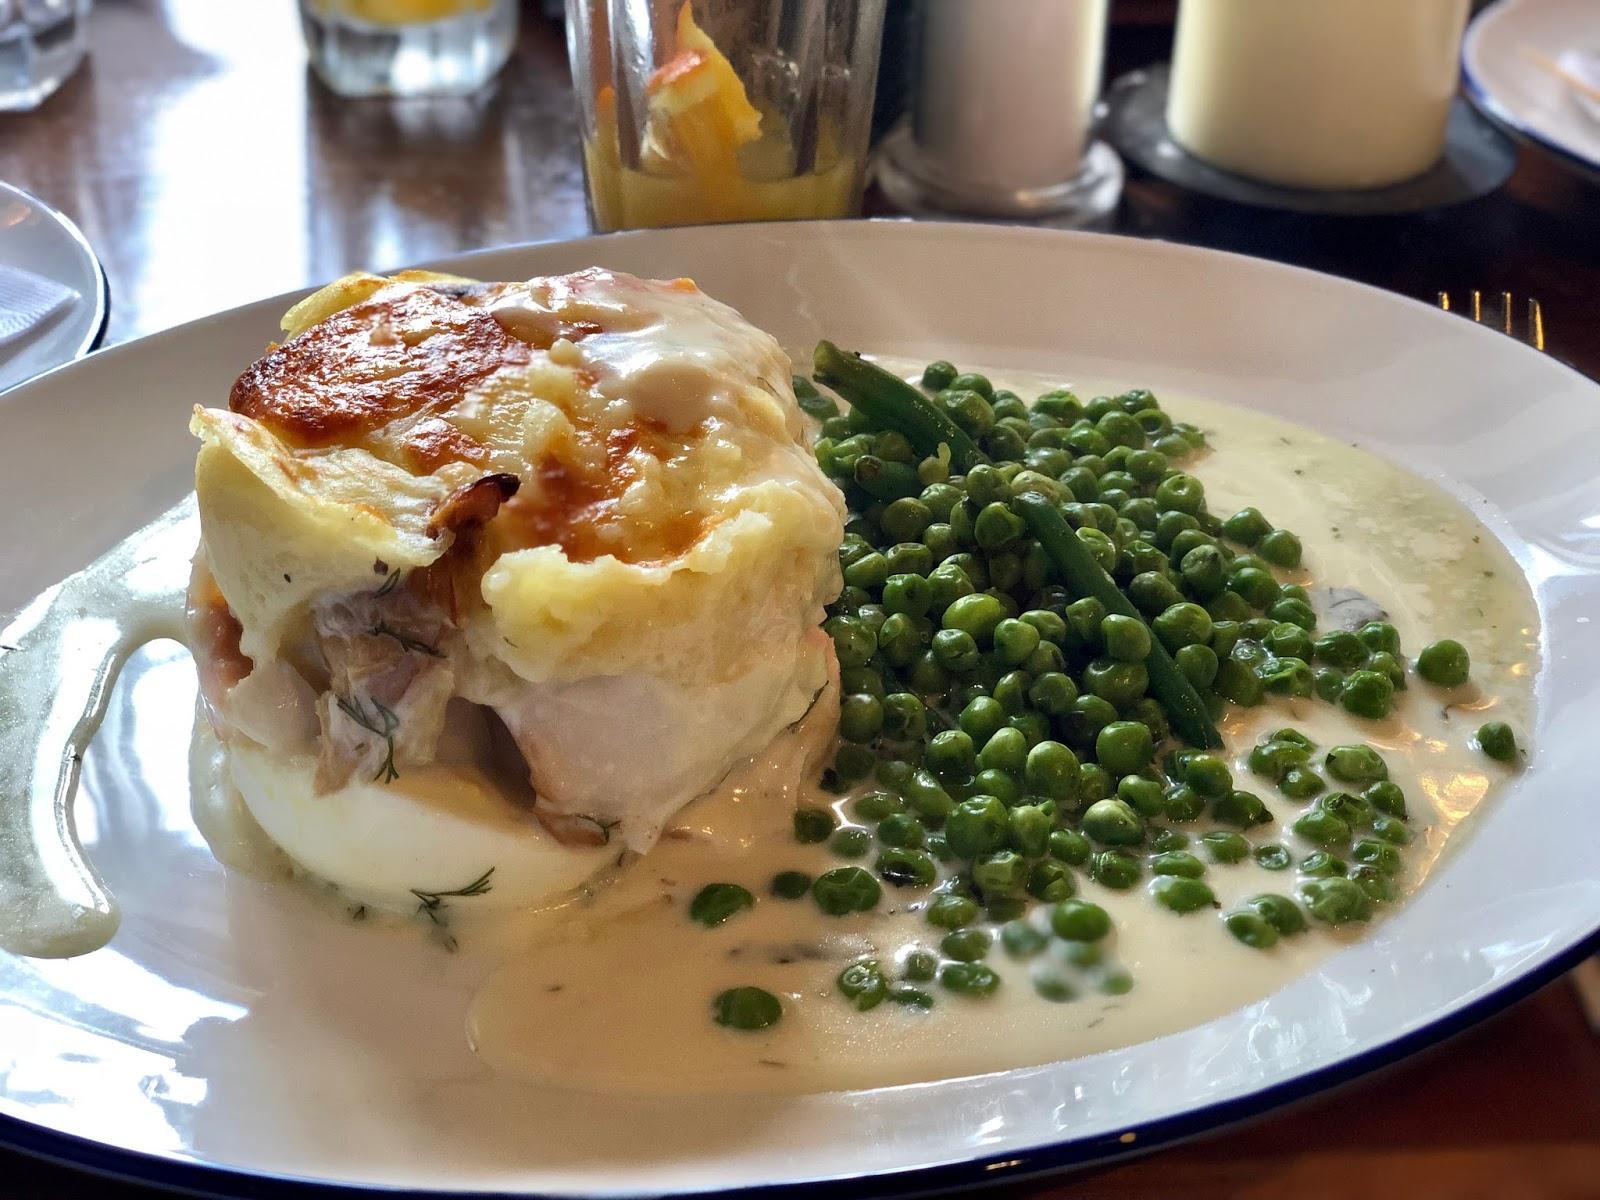 Restaurant: The Dysart Arms - Bunbury, Cheshire - Food & Baker